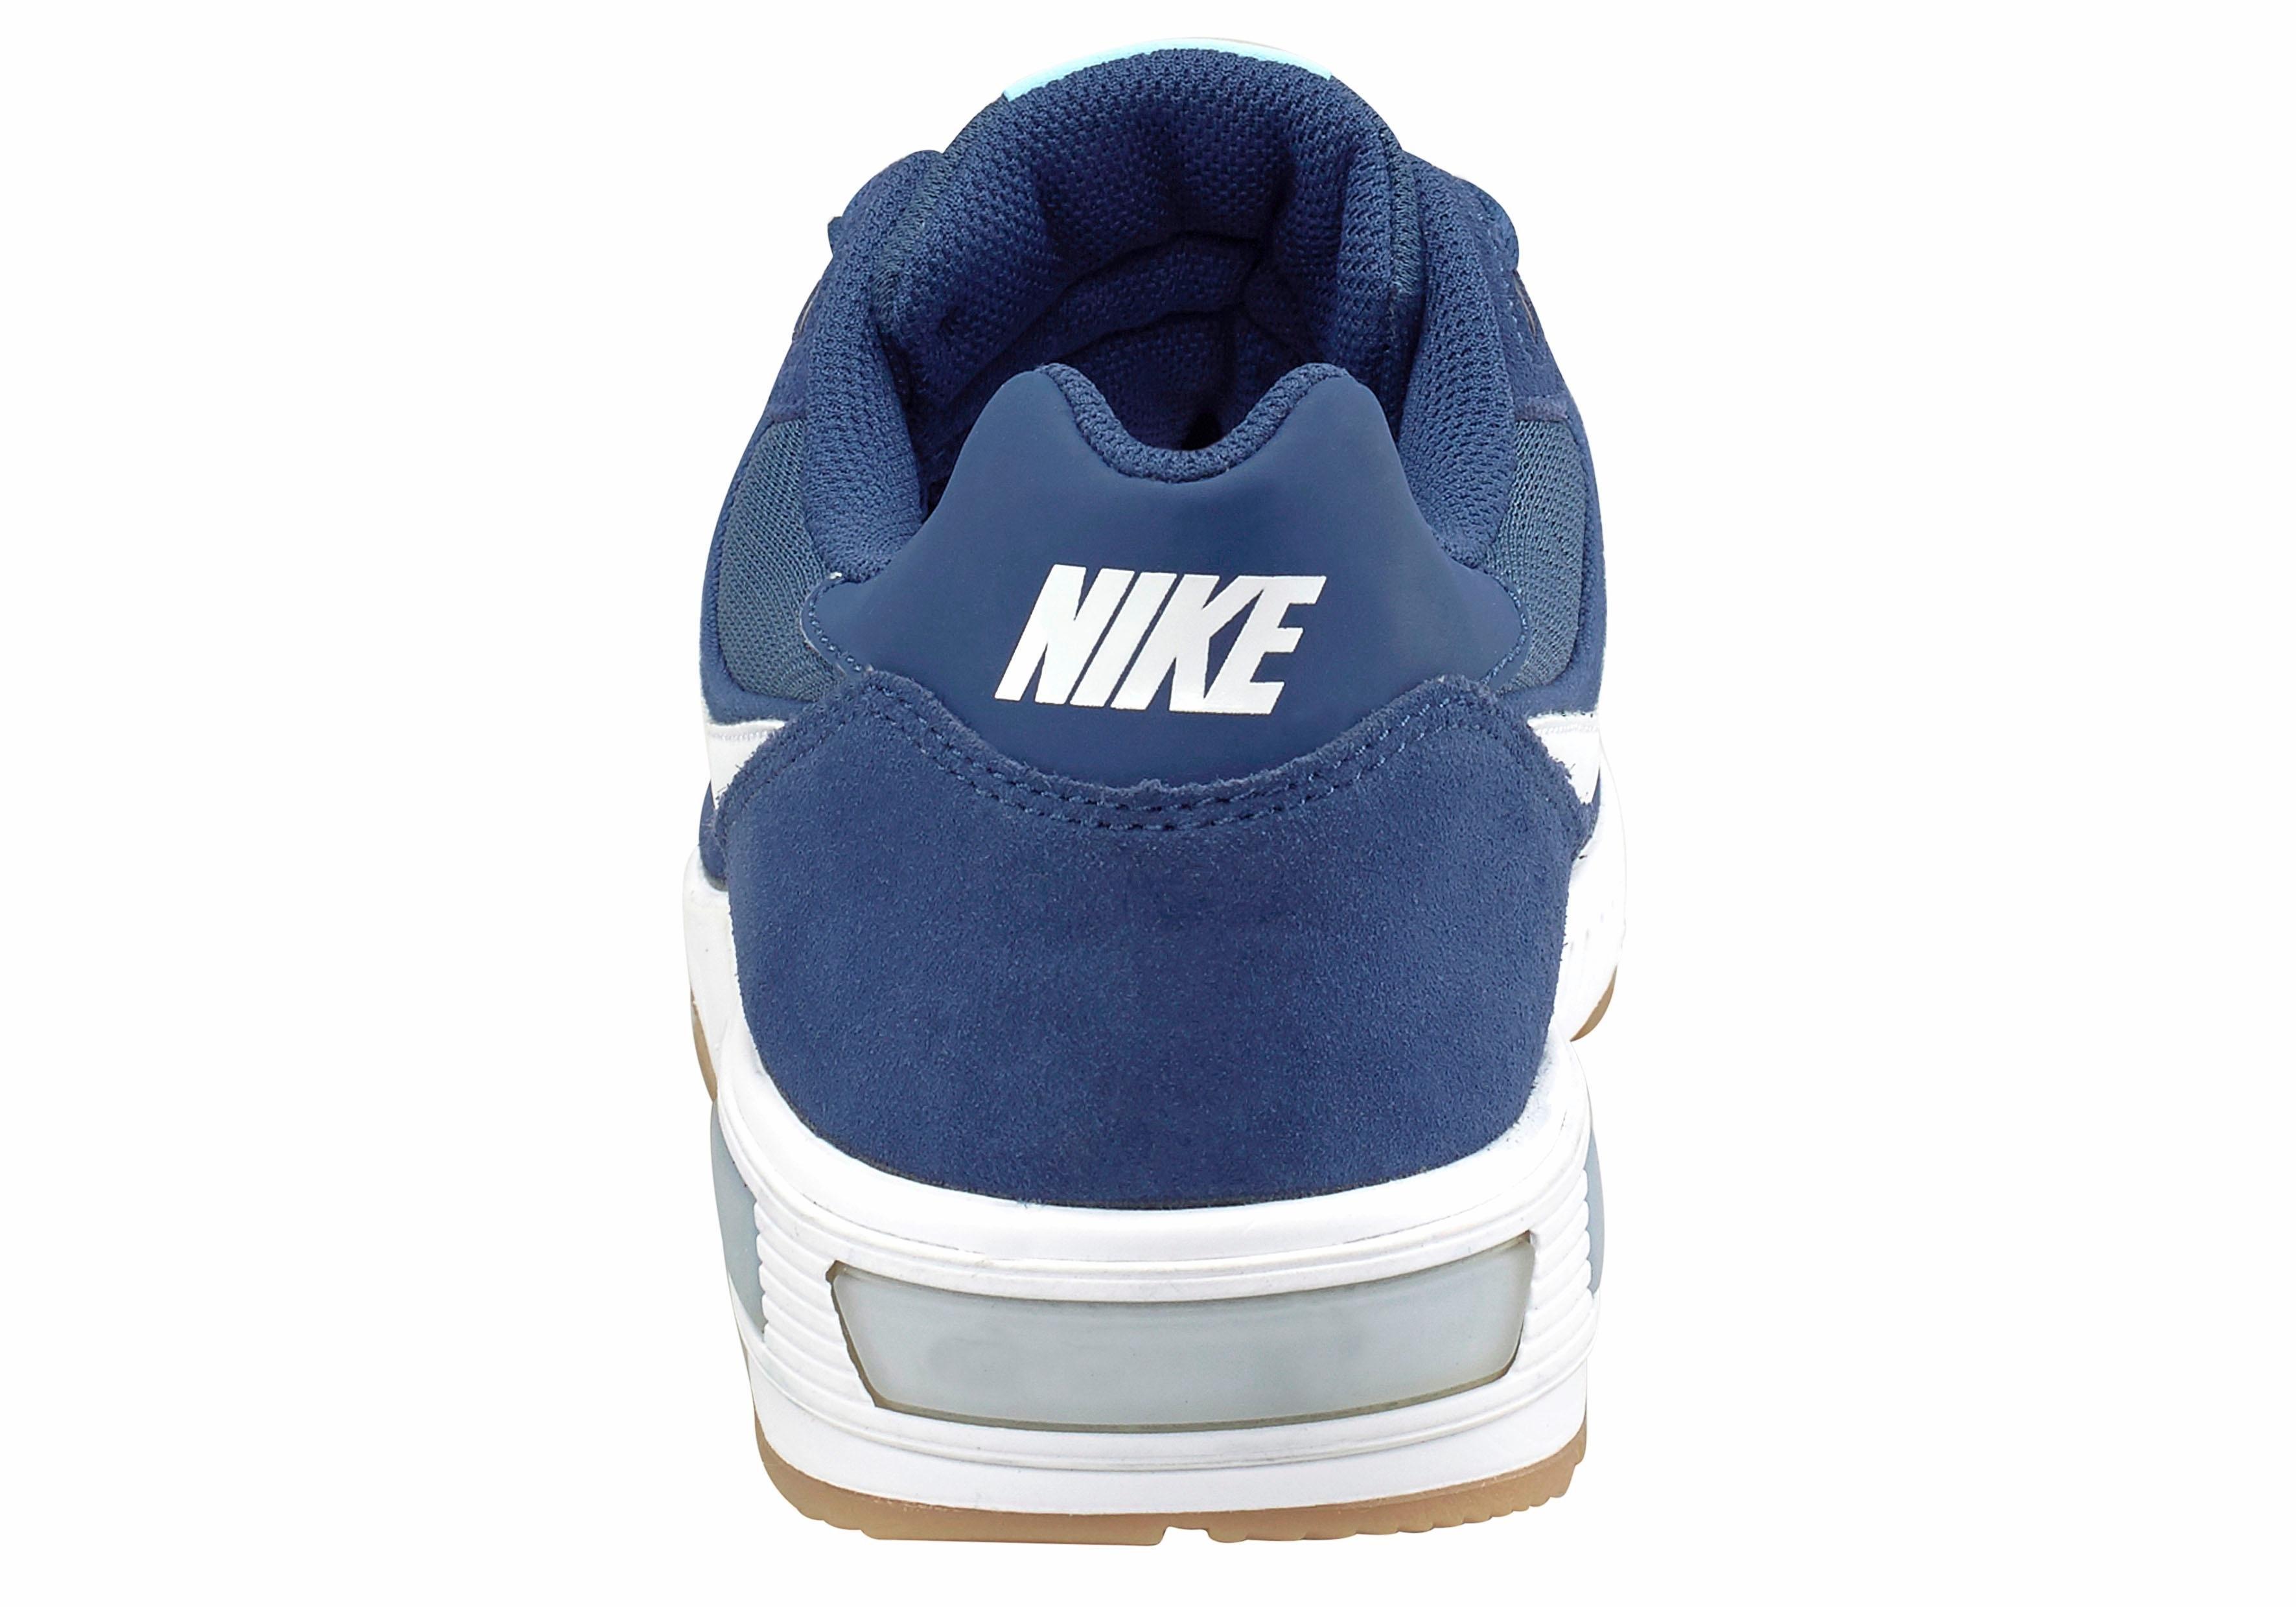 Sneakersnightgazer Shoppen Sneakersnightgazer Nike Shoppen Online Online Nike SMqzUGVp